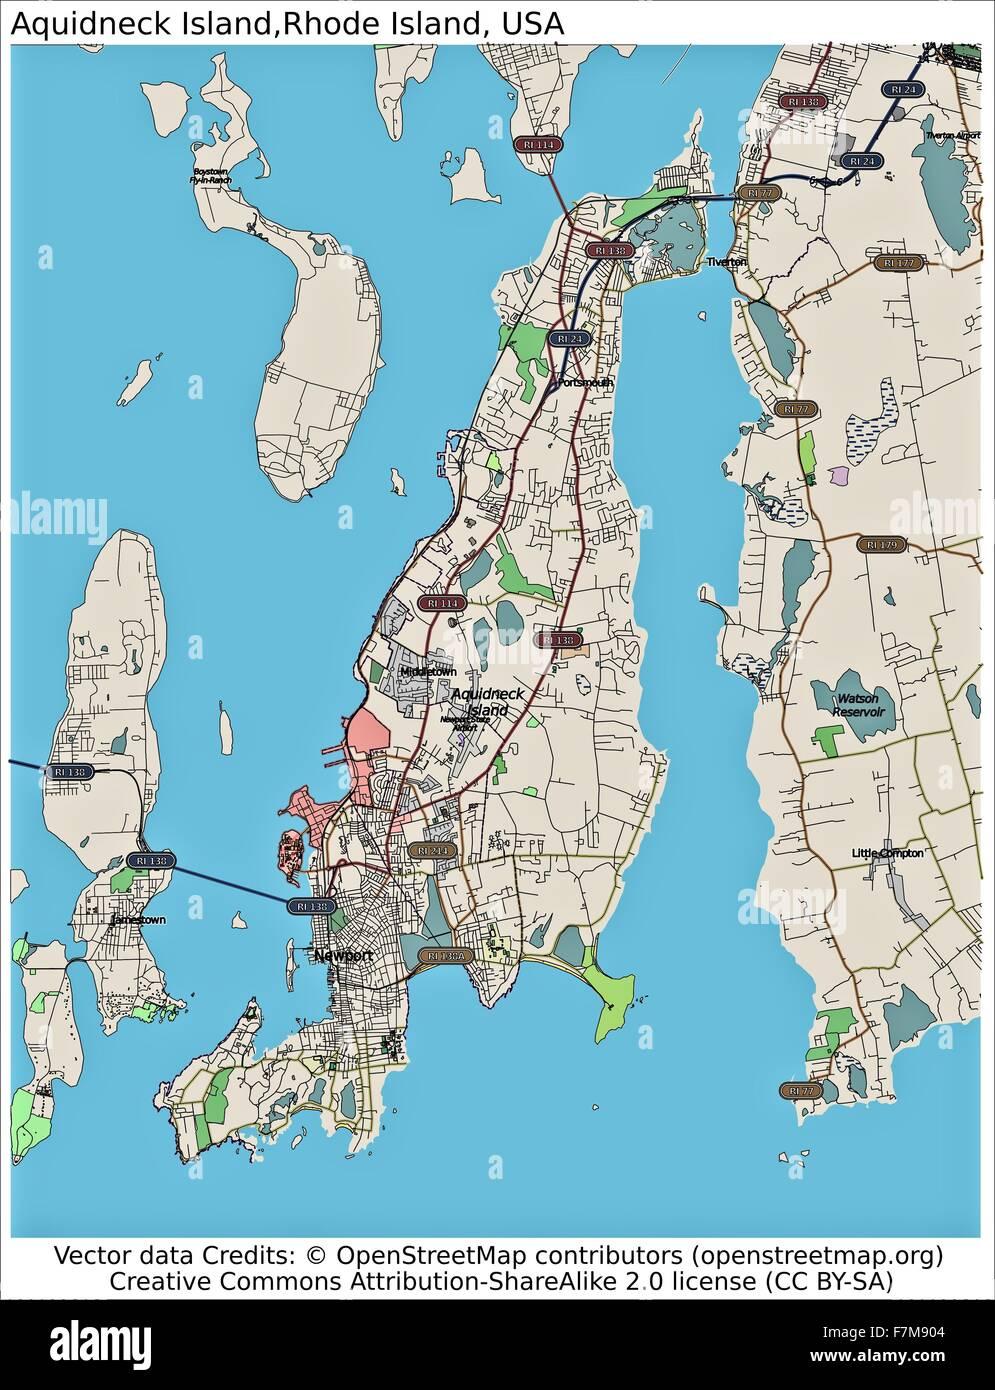 Aquidneck Rhode Island USA island city map Stock Photo Royalty